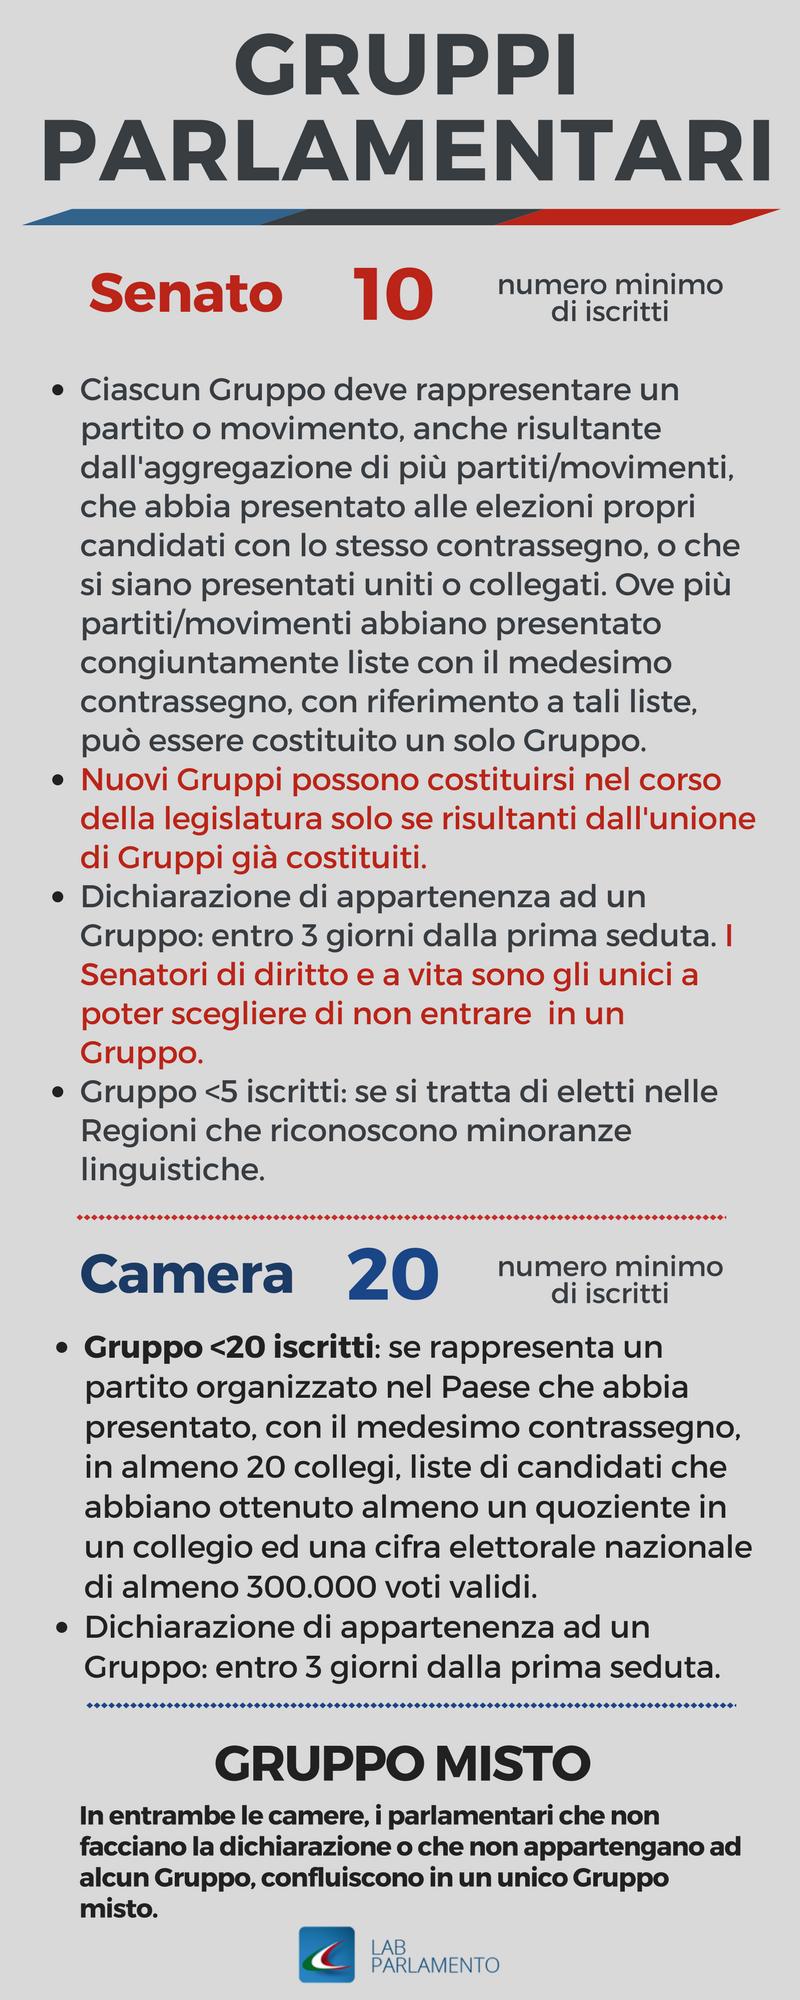 Infografica gruppi parlamentari